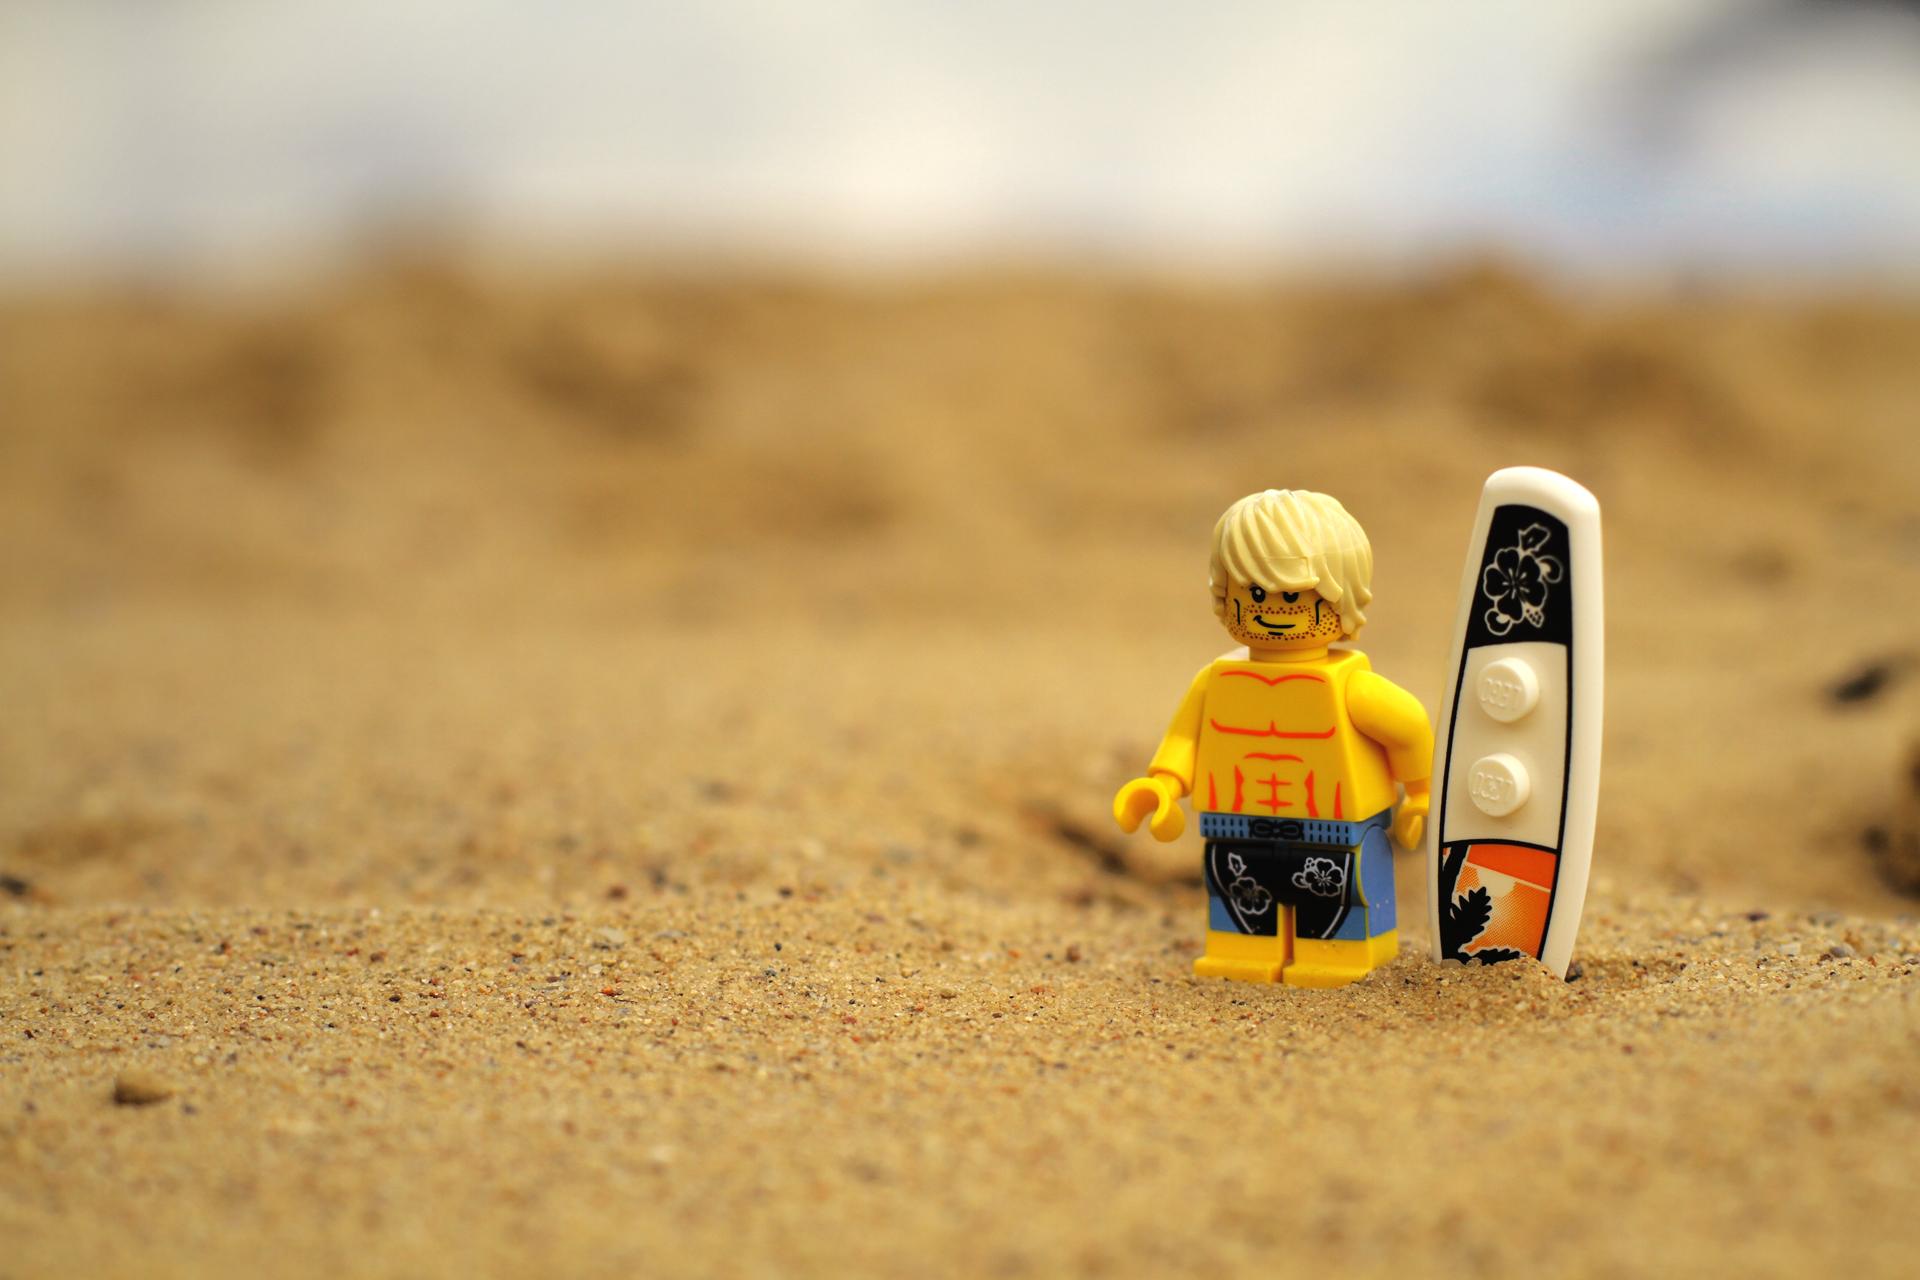 25 Excellent HD Lego Wallpapers - HDWallSource.com